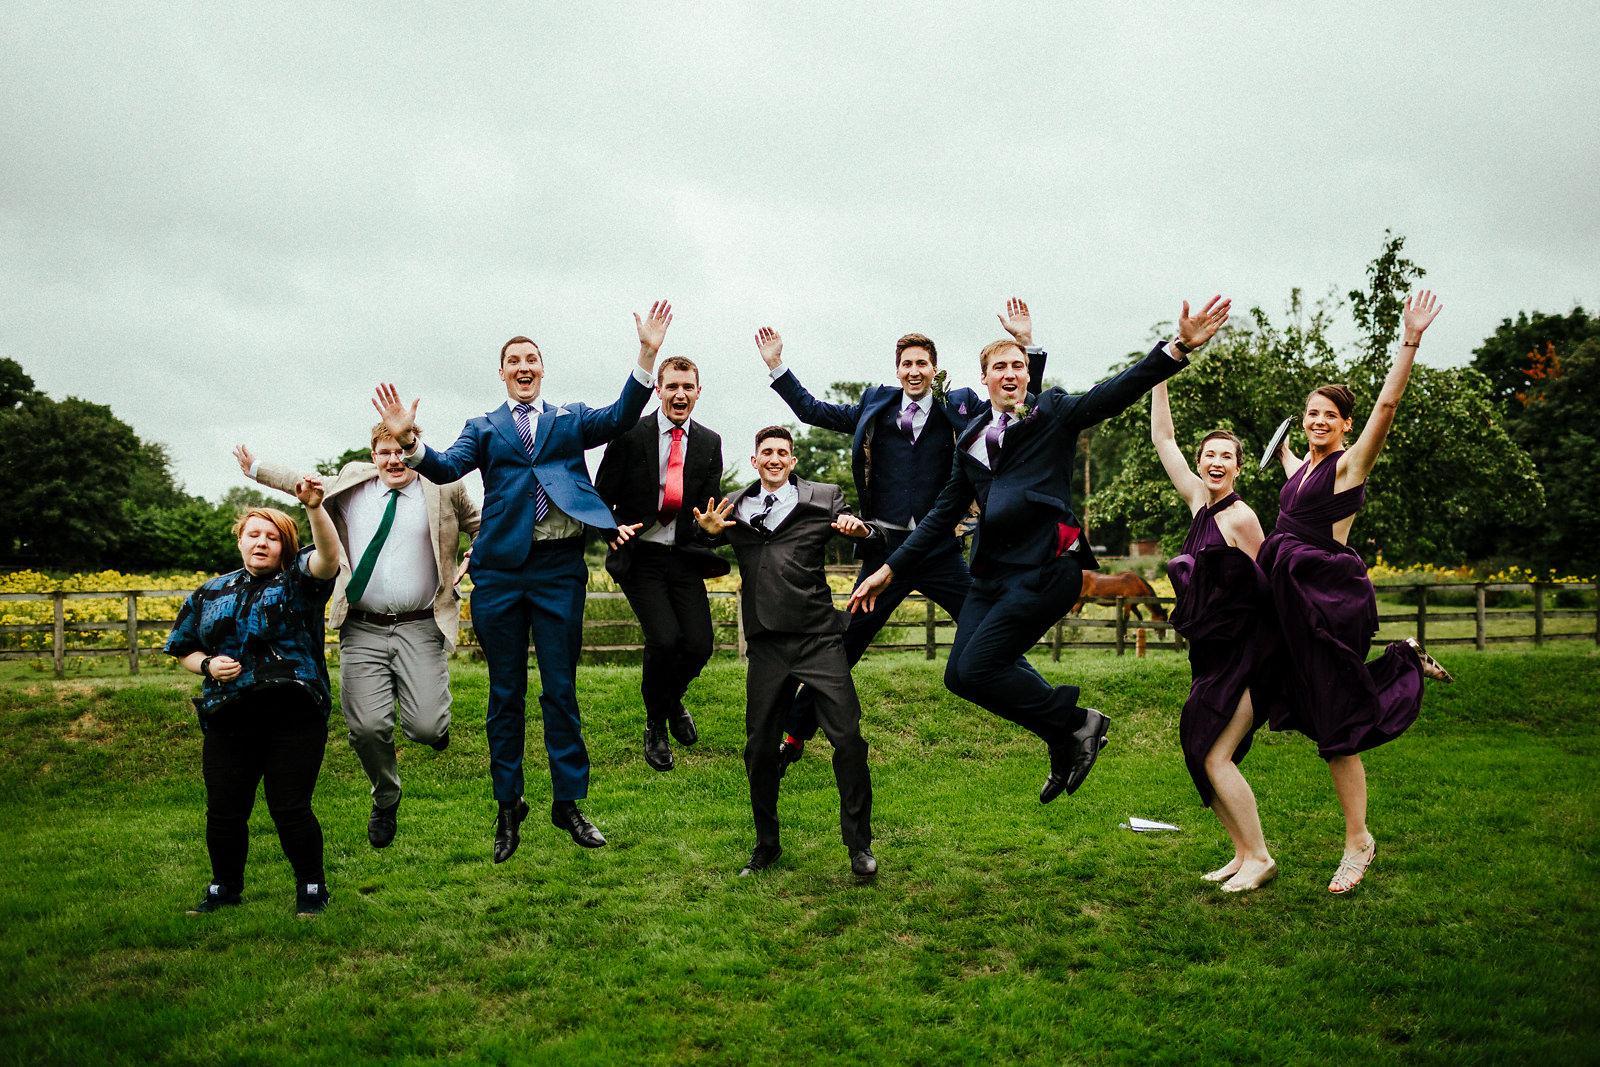 Fun wedding day group photo